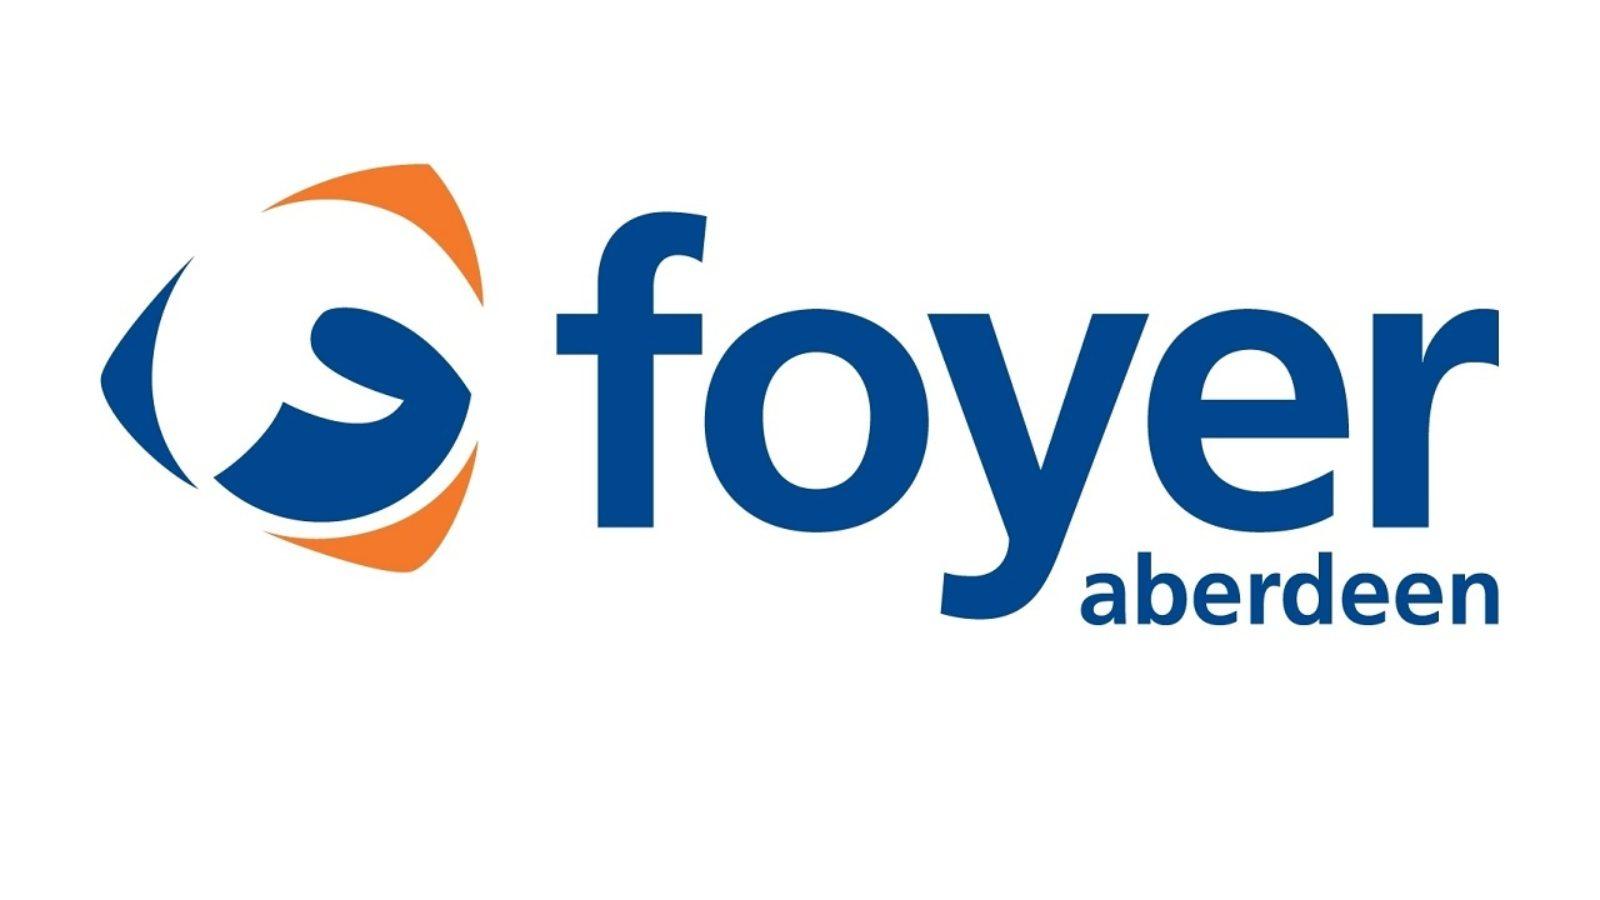 Aberdeen Foyer secures critical funding boost